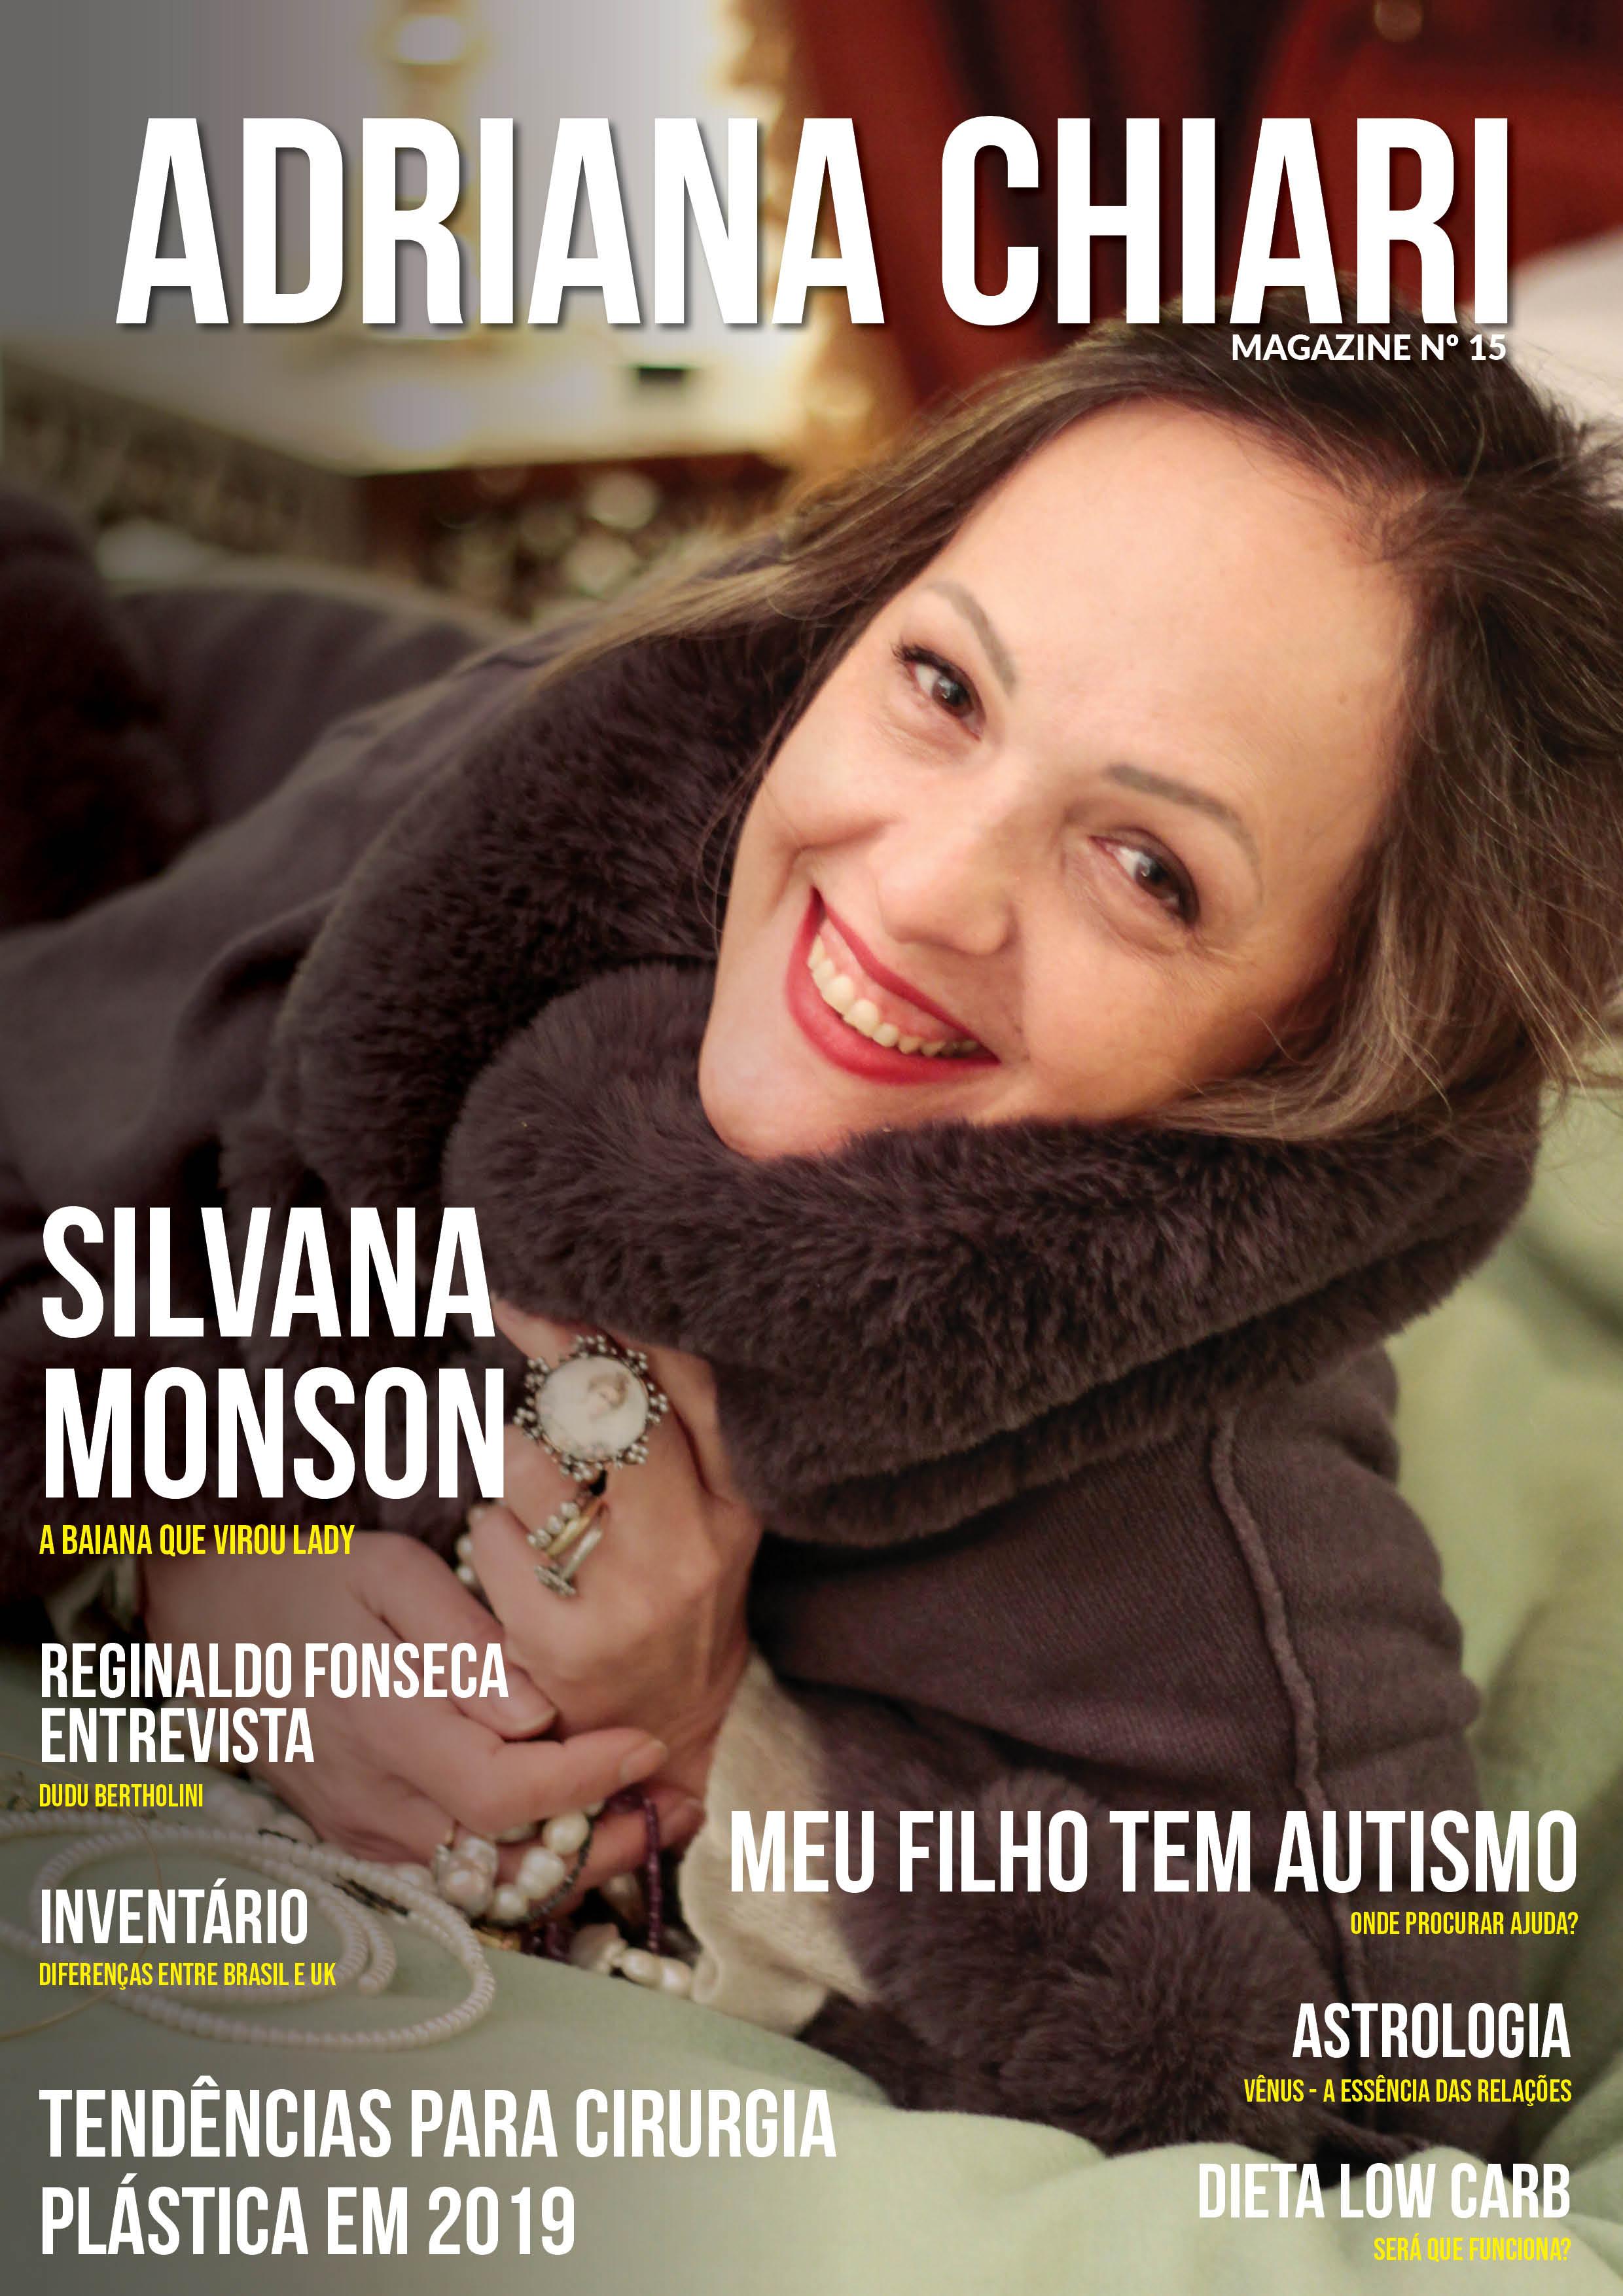 15ª Edição Adriana Chiari Magazine - Março - 2019